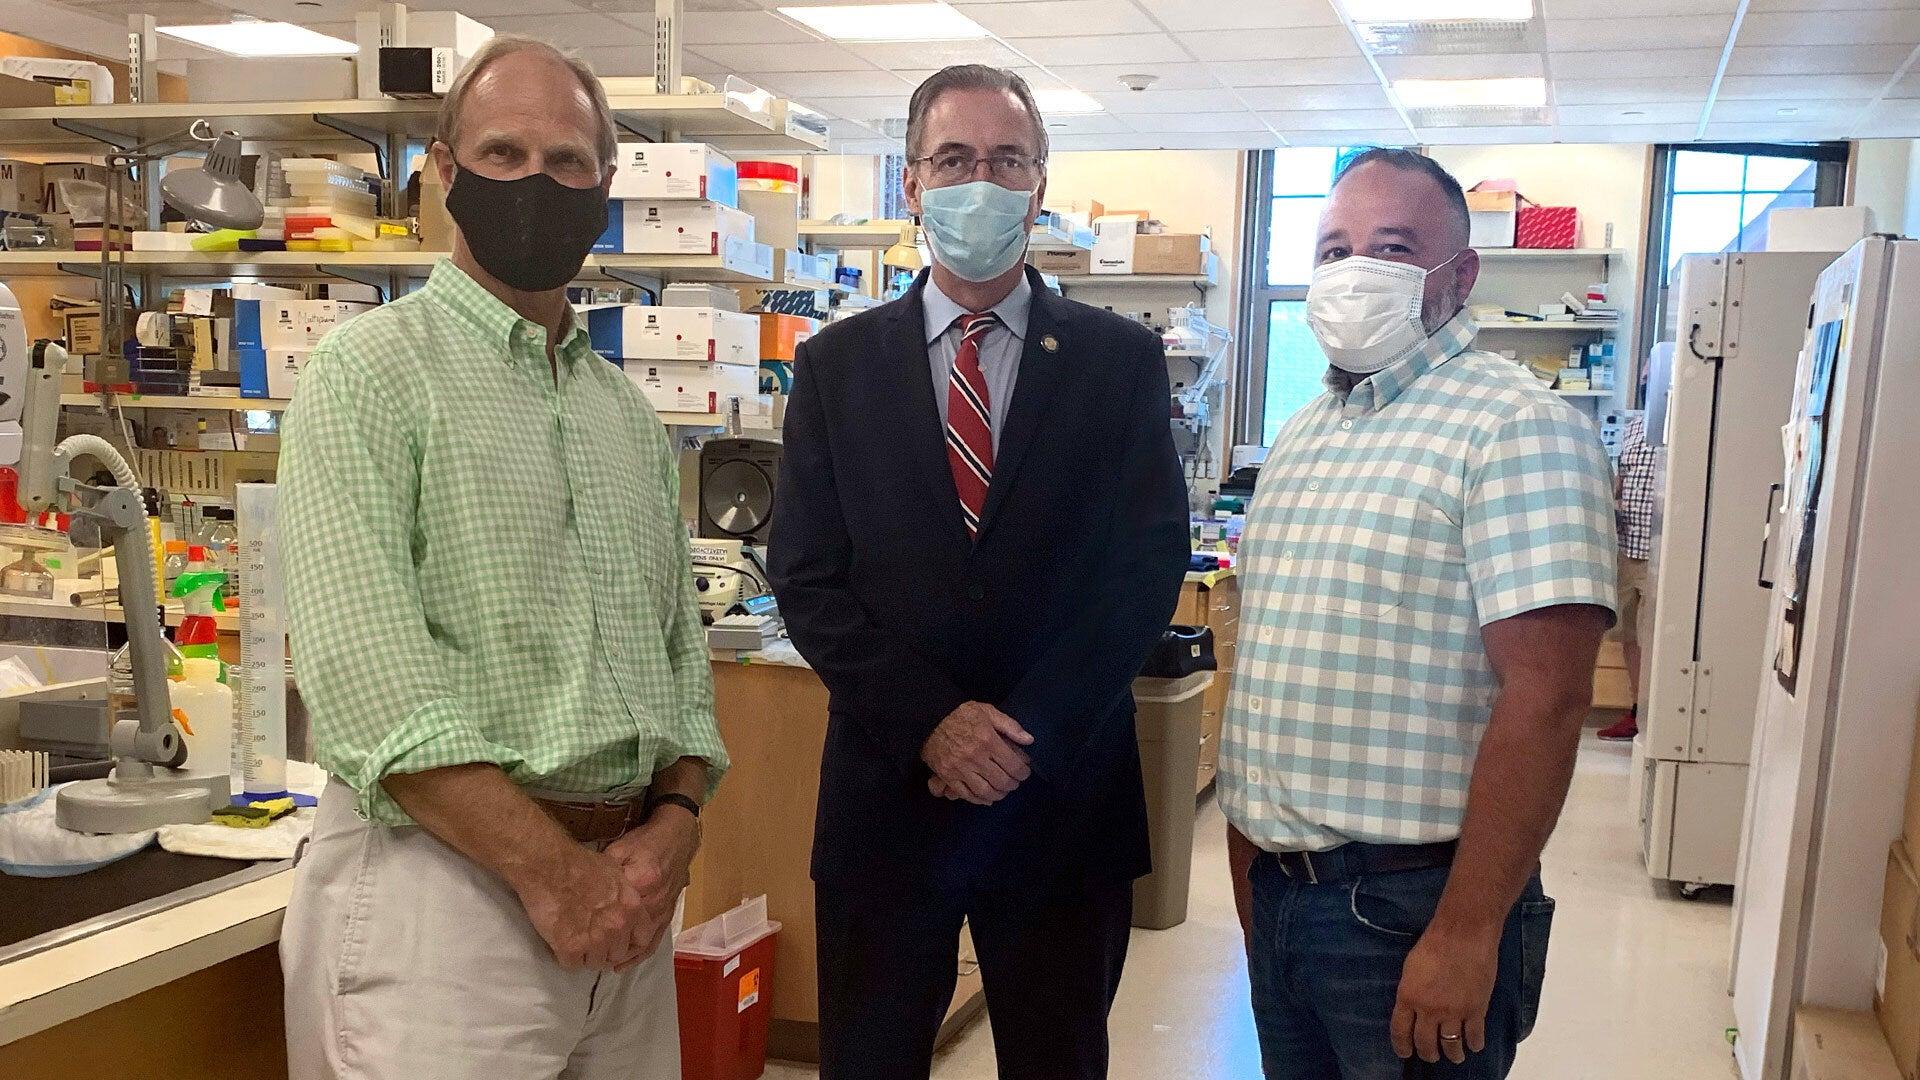 photo of John Tuke, NYS Senator James Gaughran, and Steve Monez